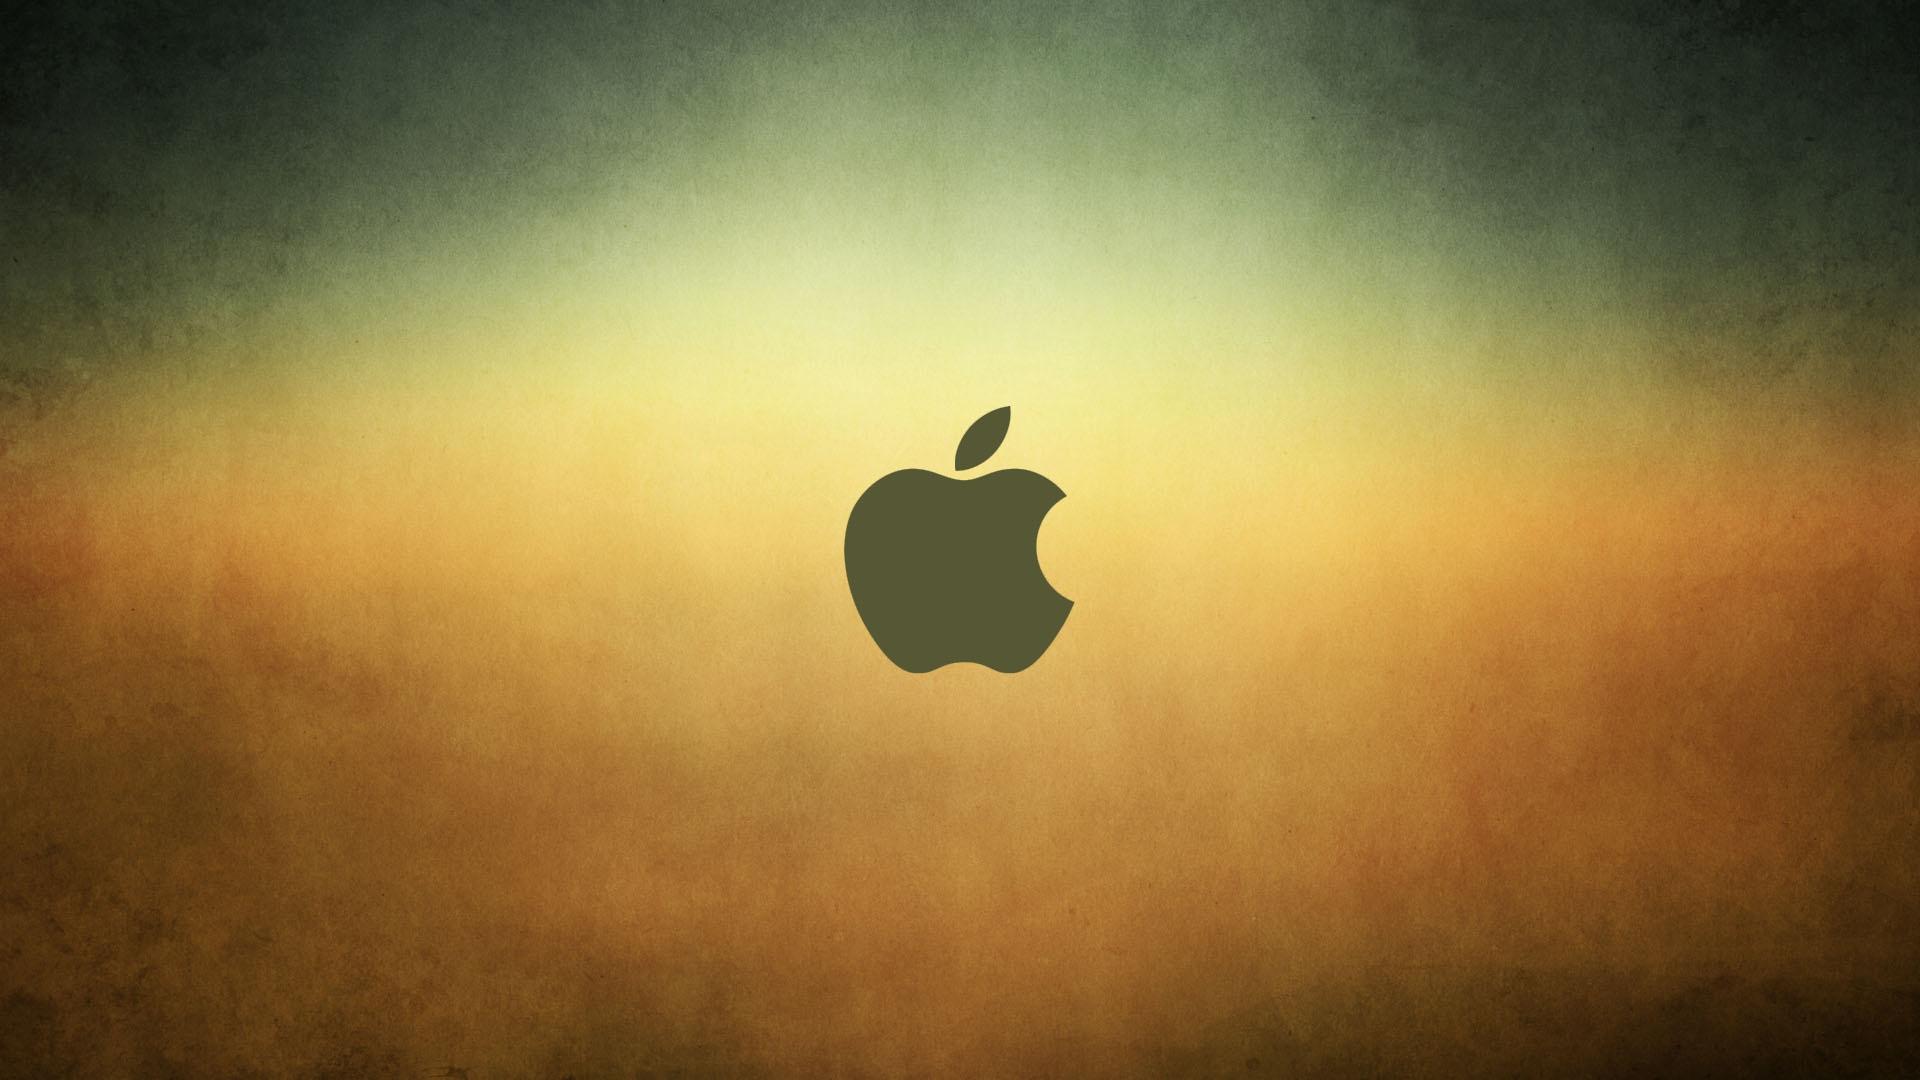 new apple wallpapers,sky,cloud,leaf,fruit,plant